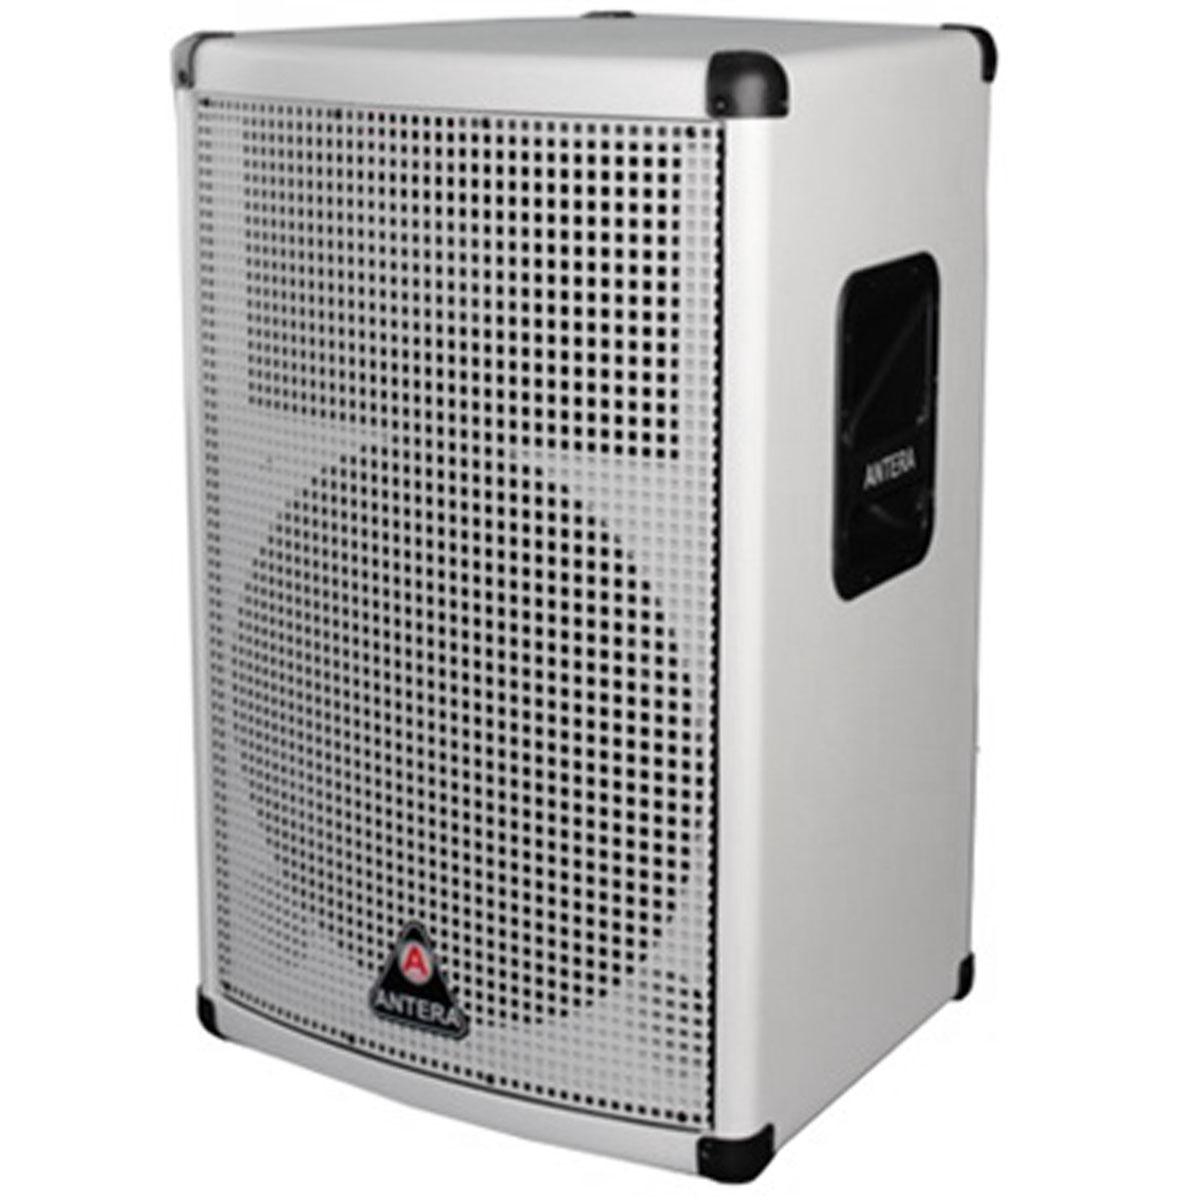 Caixa Passiva 100W Branca CP10.1 - Antera